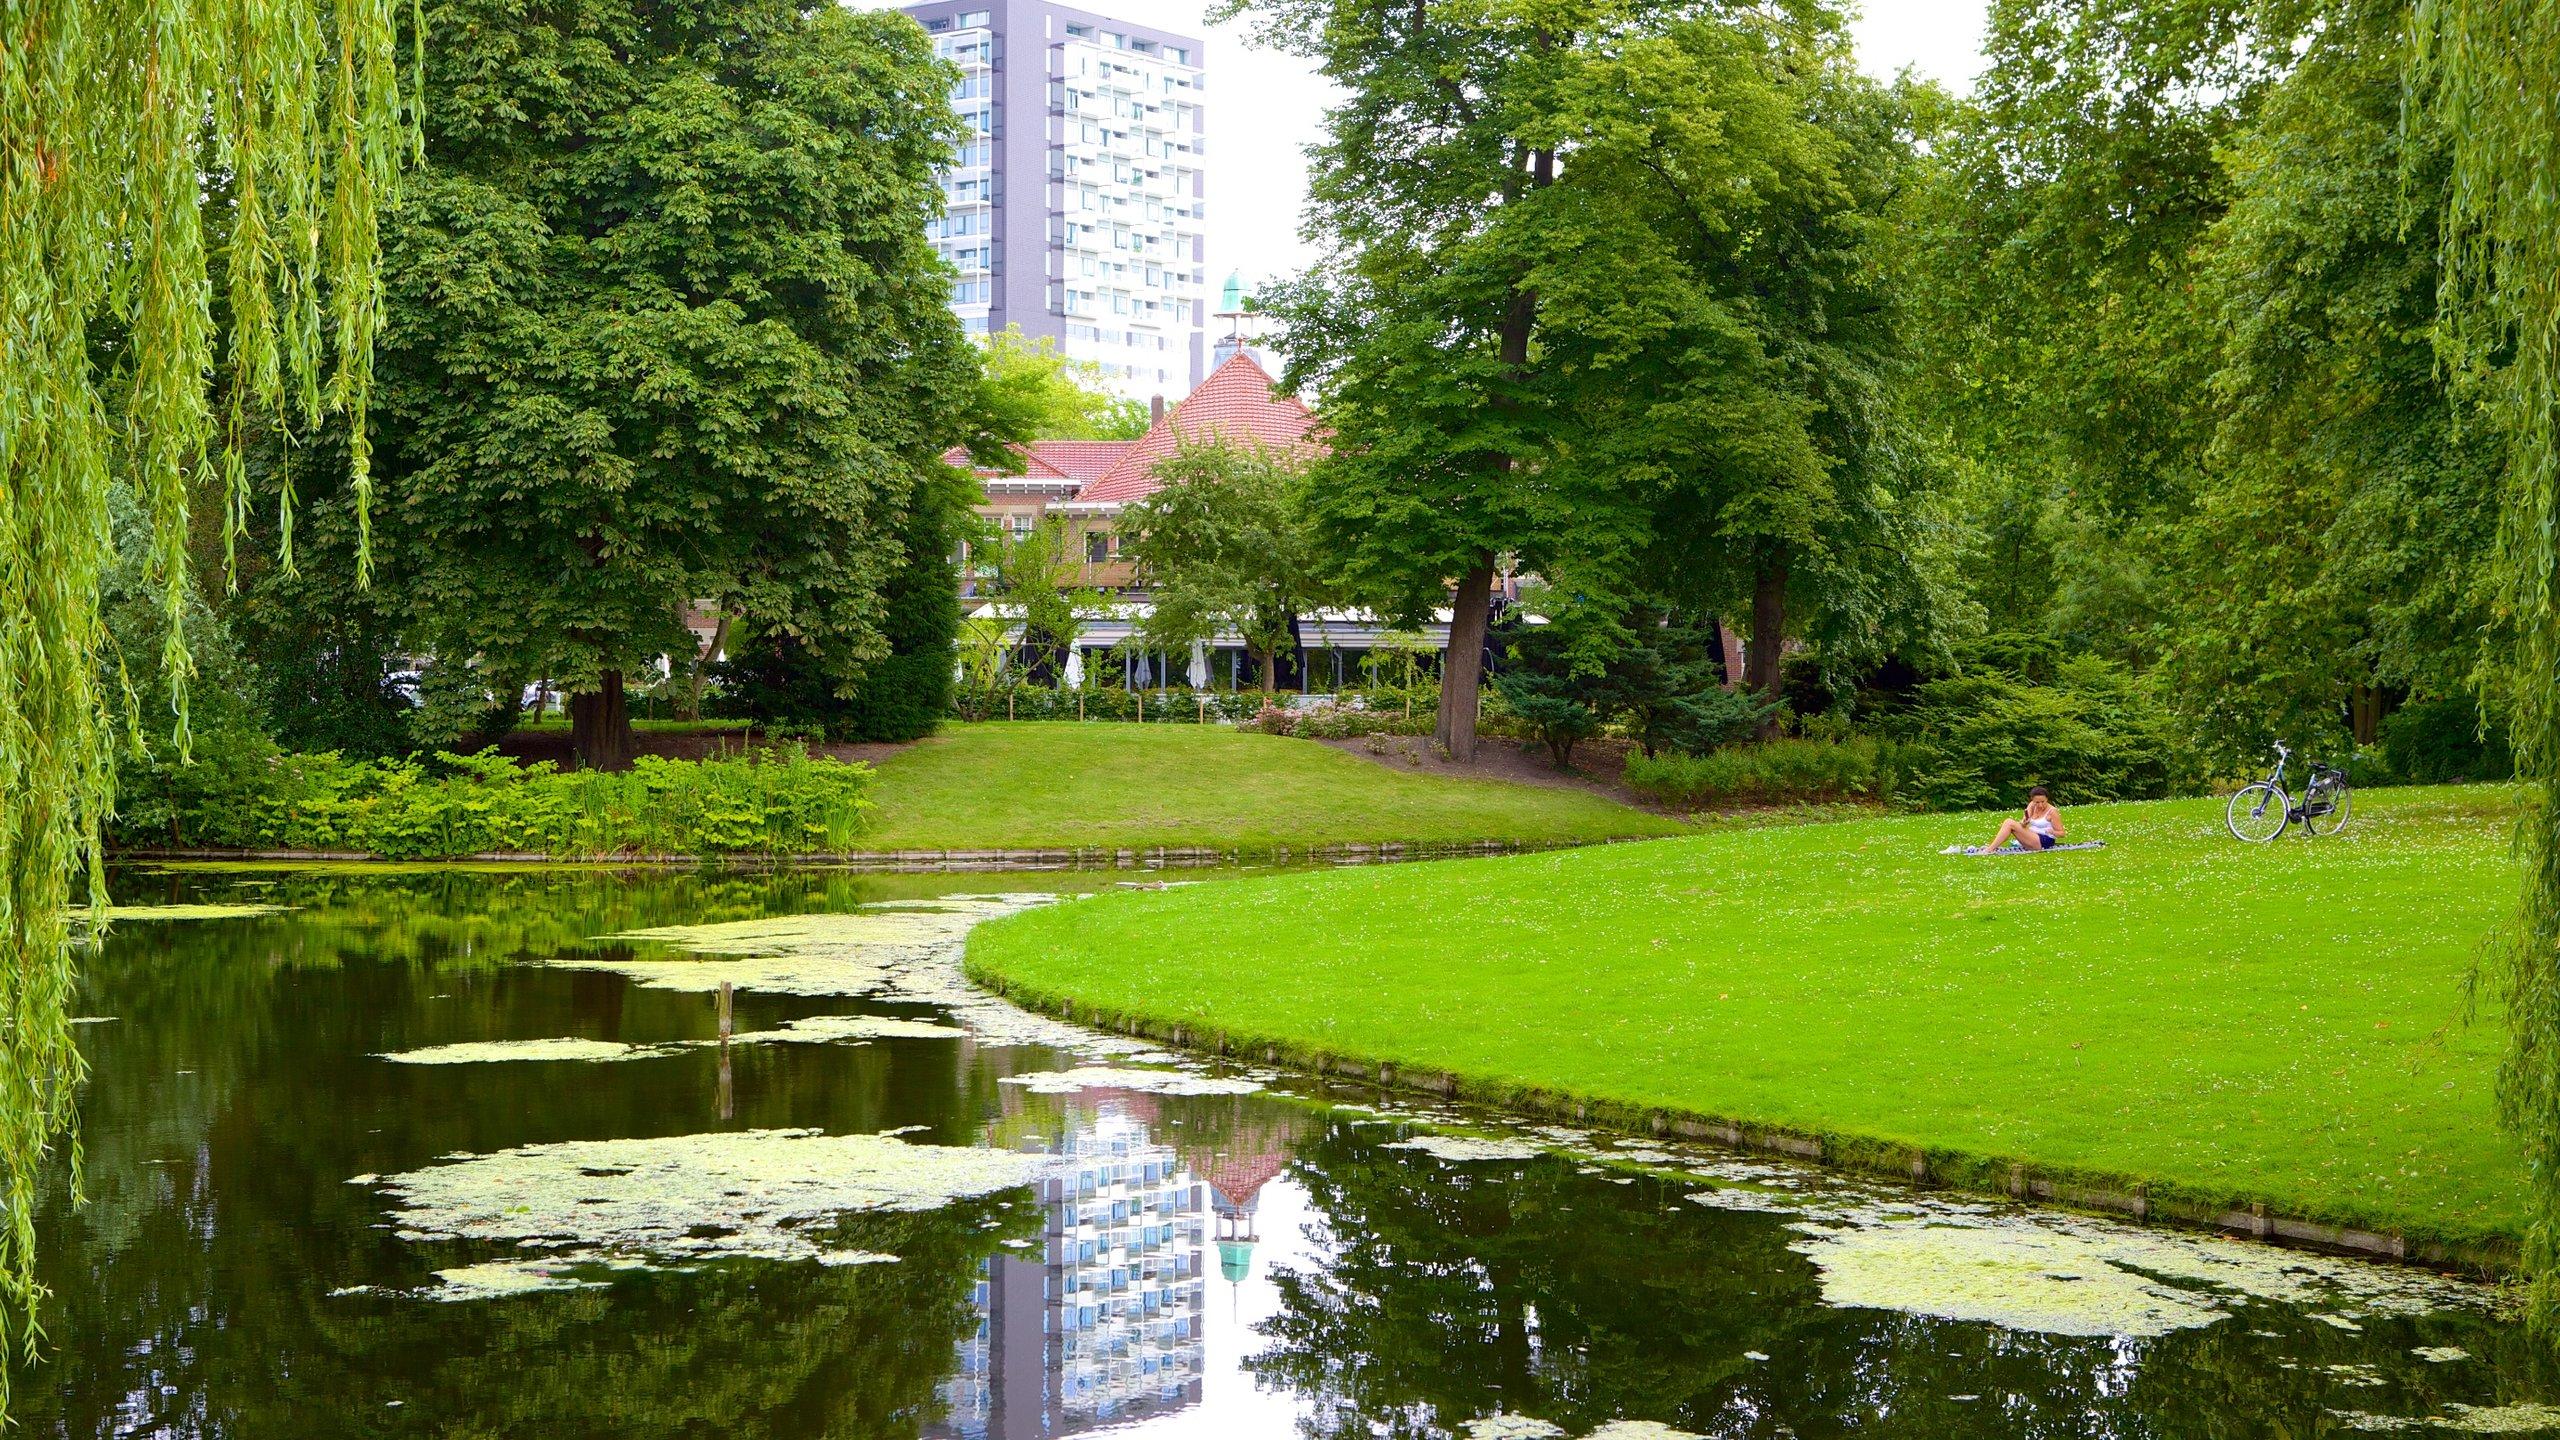 Centrum, Rotterdam, South Holland, Netherlands